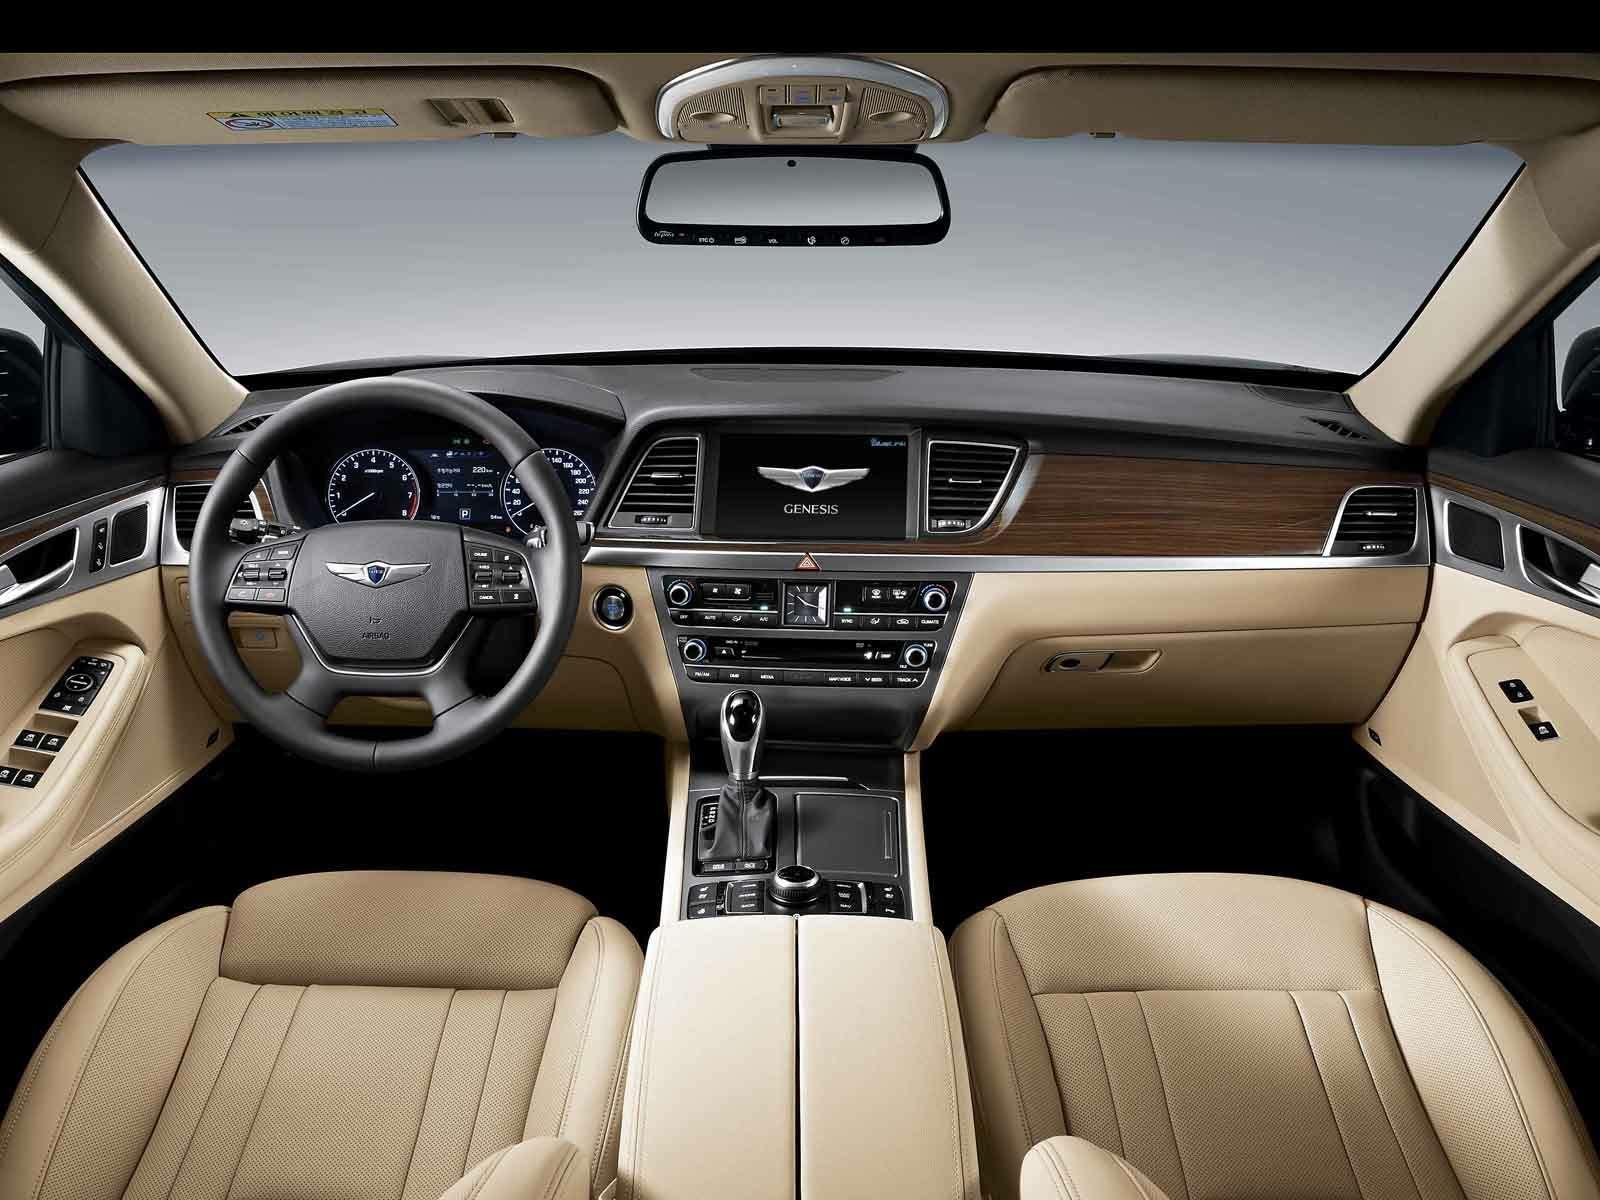 DH_Beige two-tone interior design